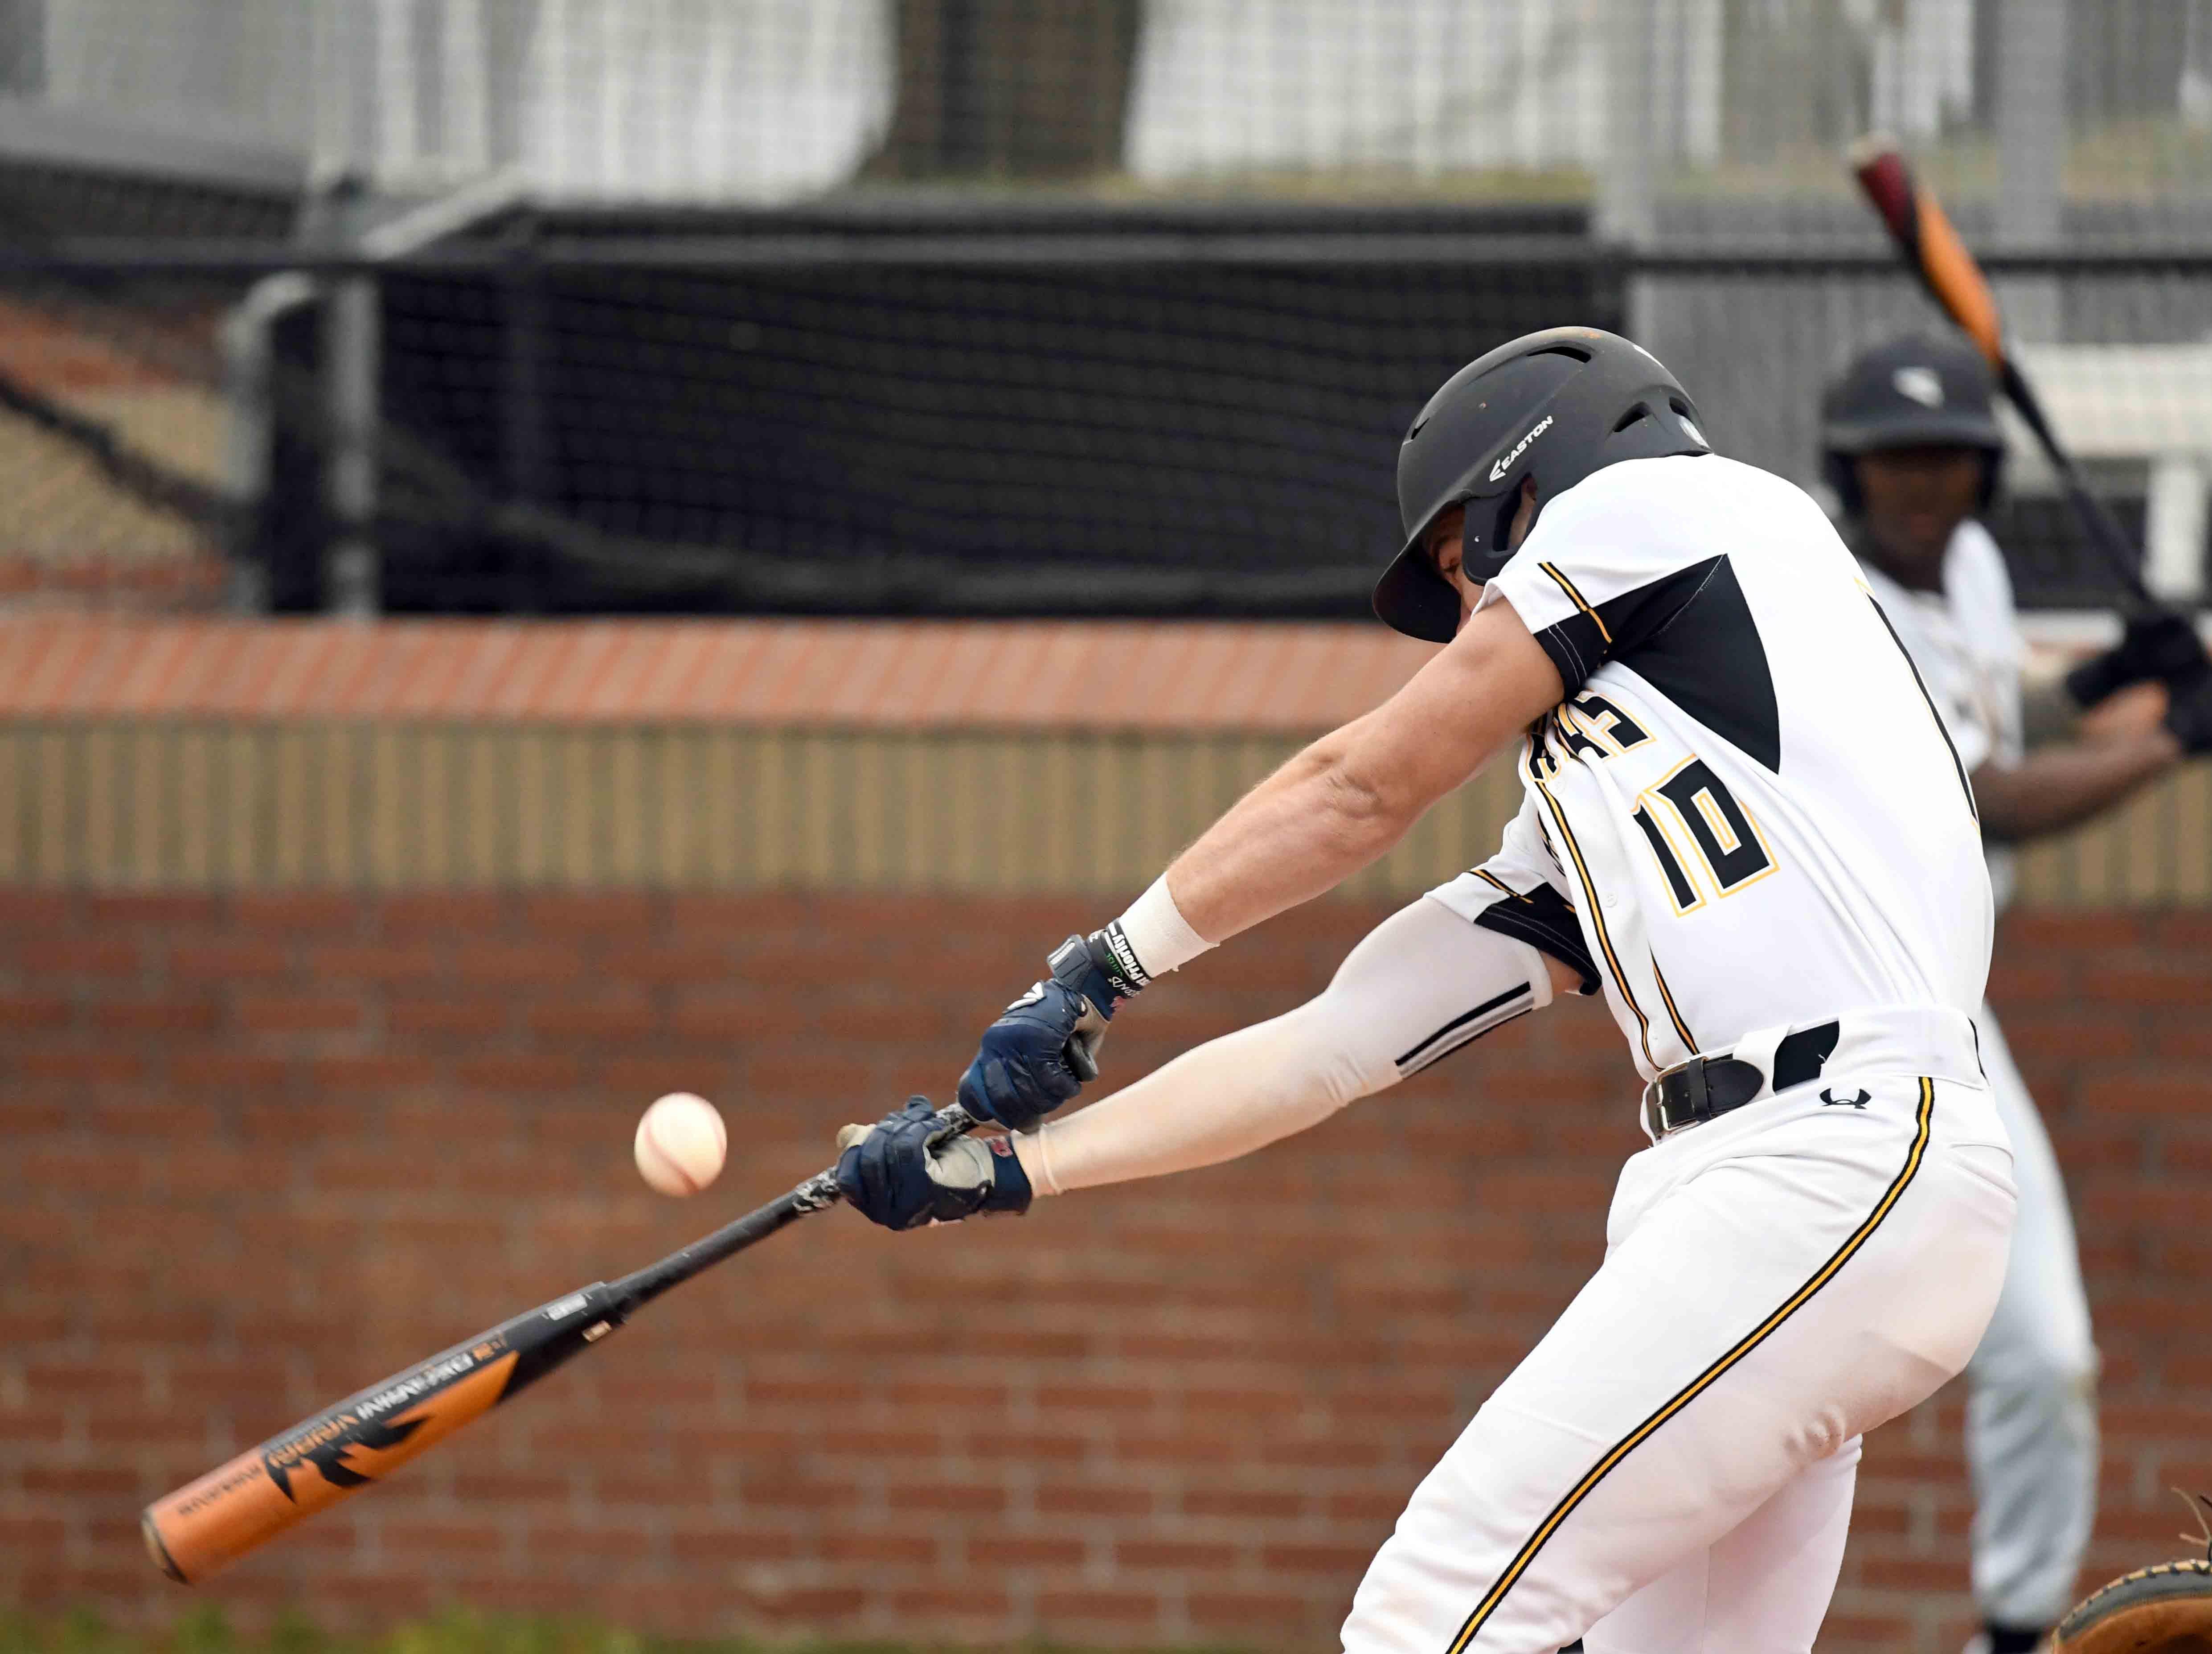 Oak Grove senior John Rhys Plumlee bats at home plate in their season opener against Seminary in Hattiesburg on Monday, February 18, 2019.